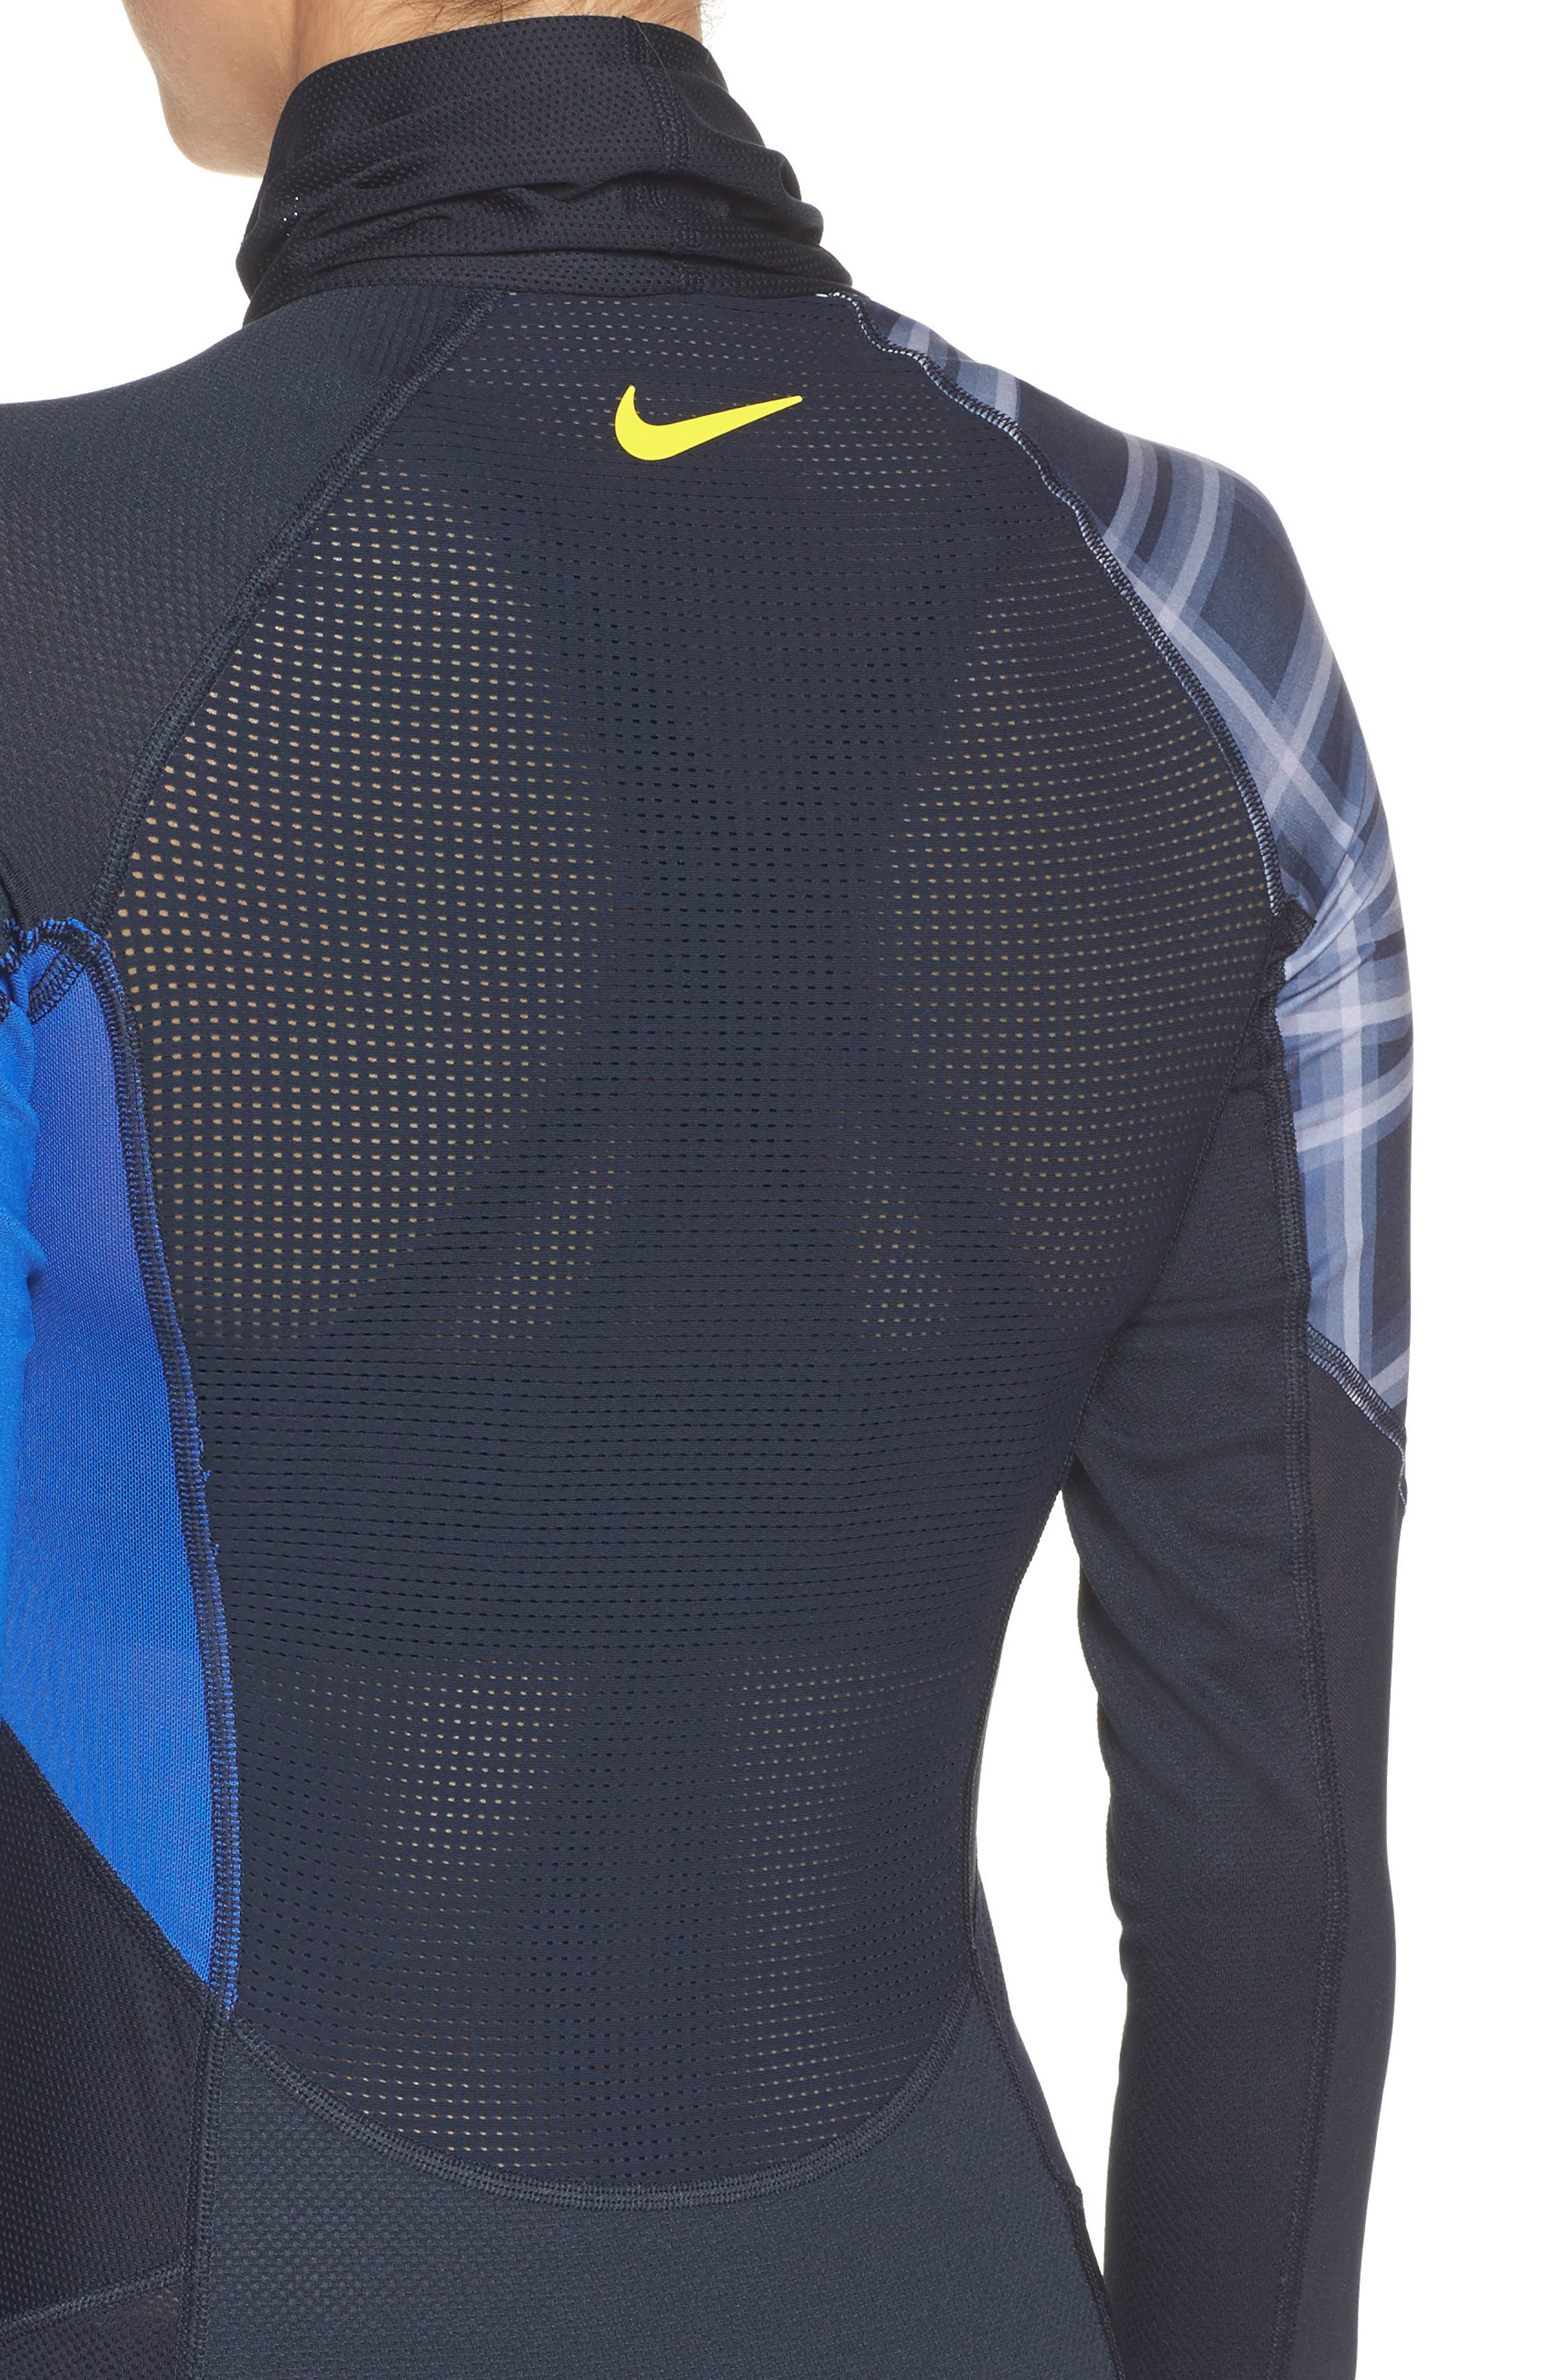 Training Pullover,                             Alternate thumbnail 4, color,                             Dark Obsidian/ Royal/ Yellow